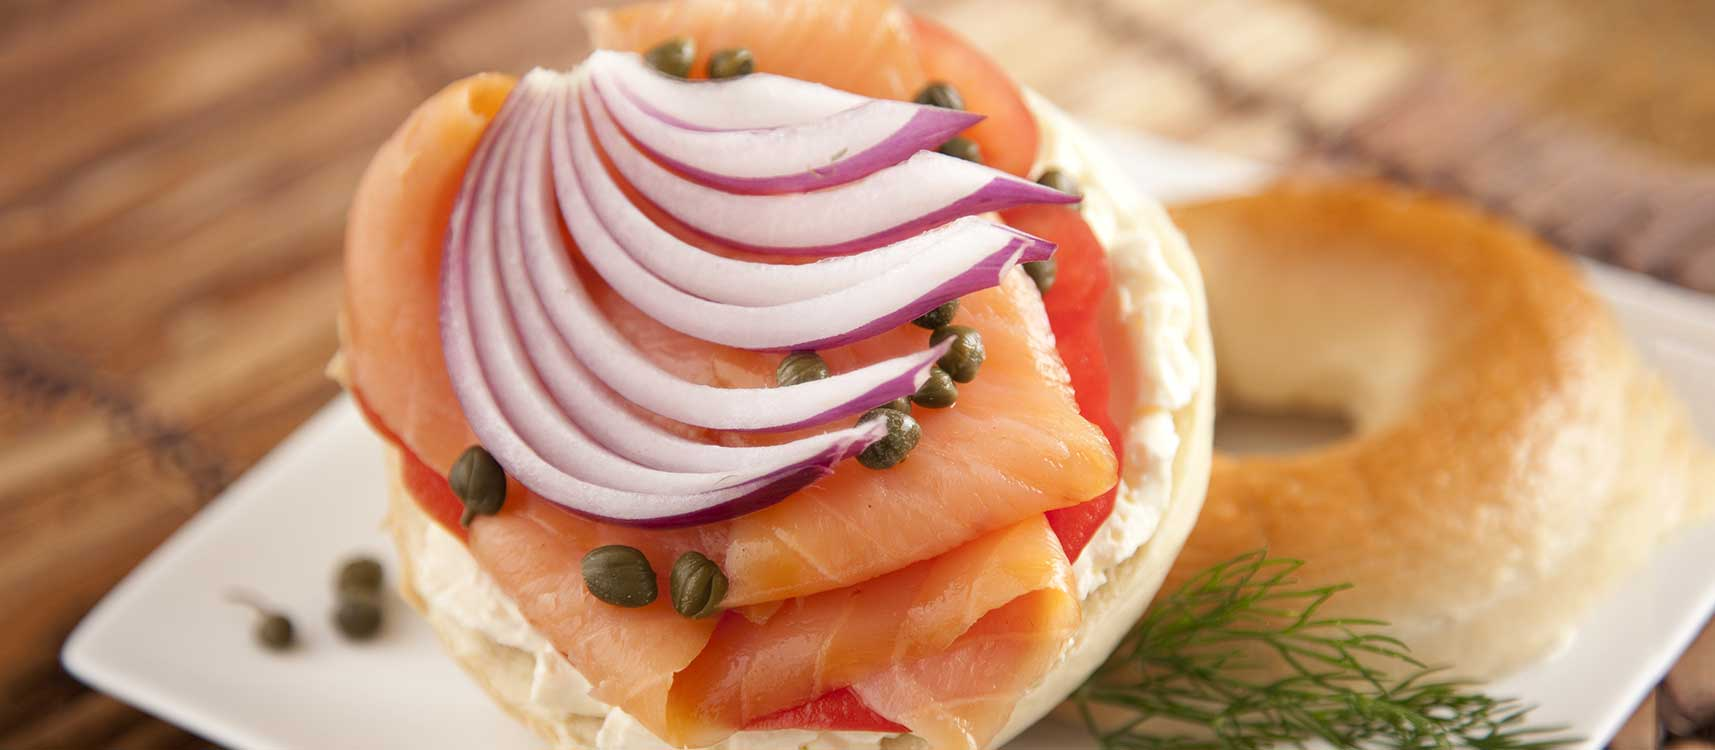 Gill's Onions - Salmon Bagel Recipe